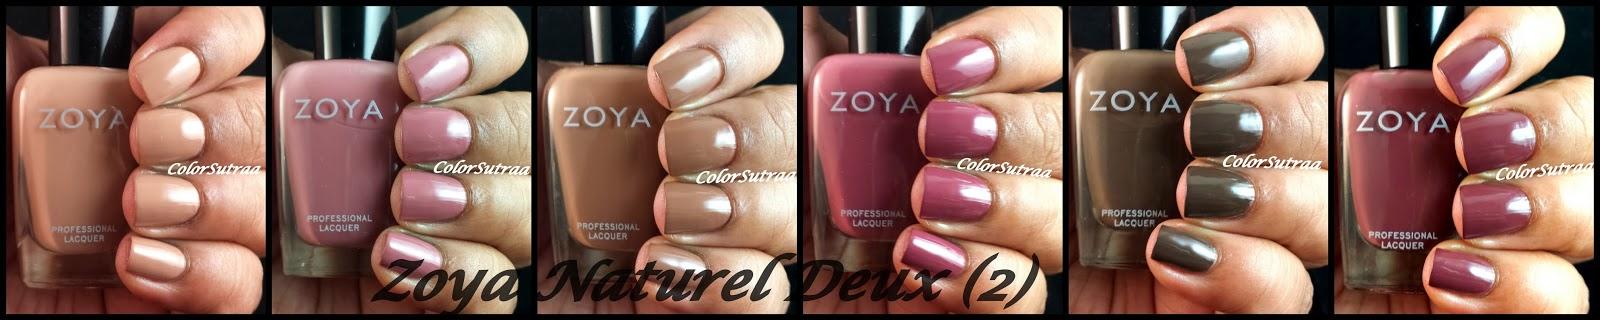 Zoya-Naturel-Deux